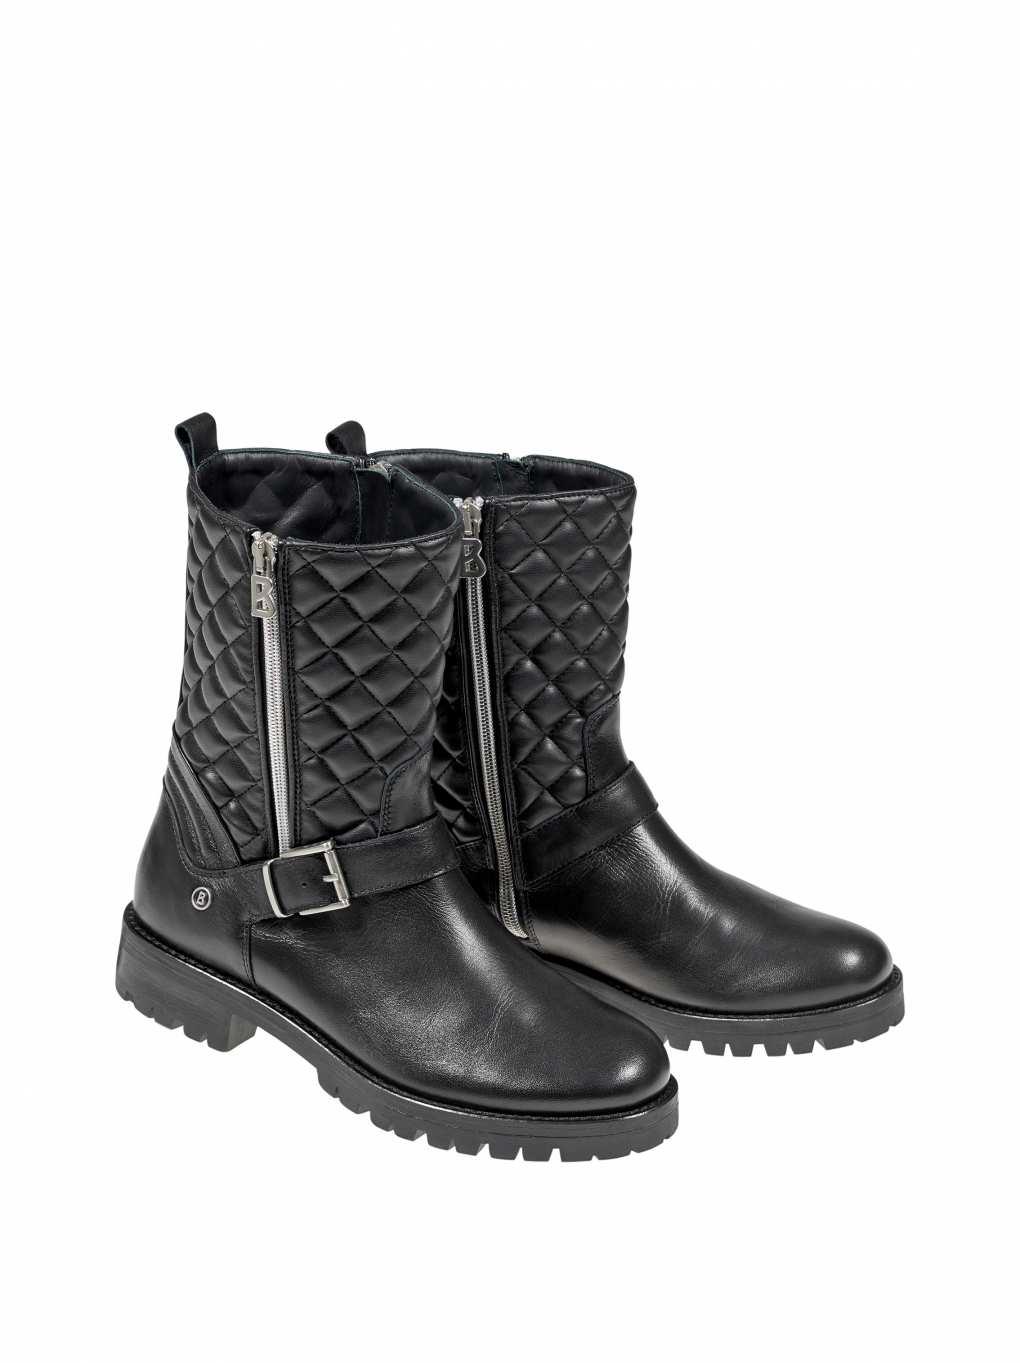 Сапоги ж Shoes woman